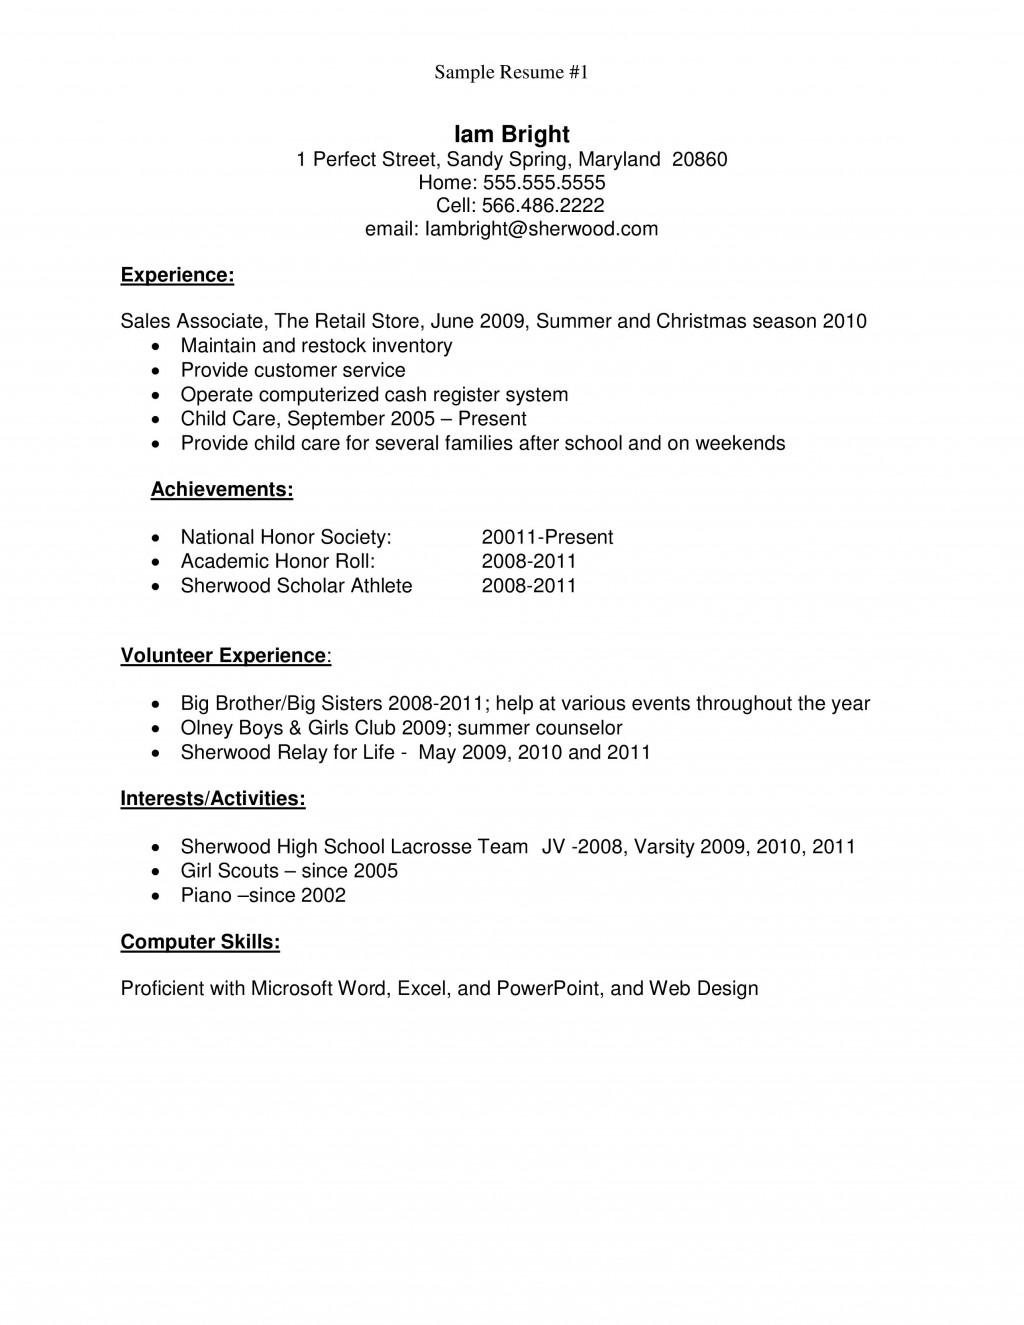 007 Singular Resume Template For First Job Design  No Experience Student Cv Nz FormatLarge